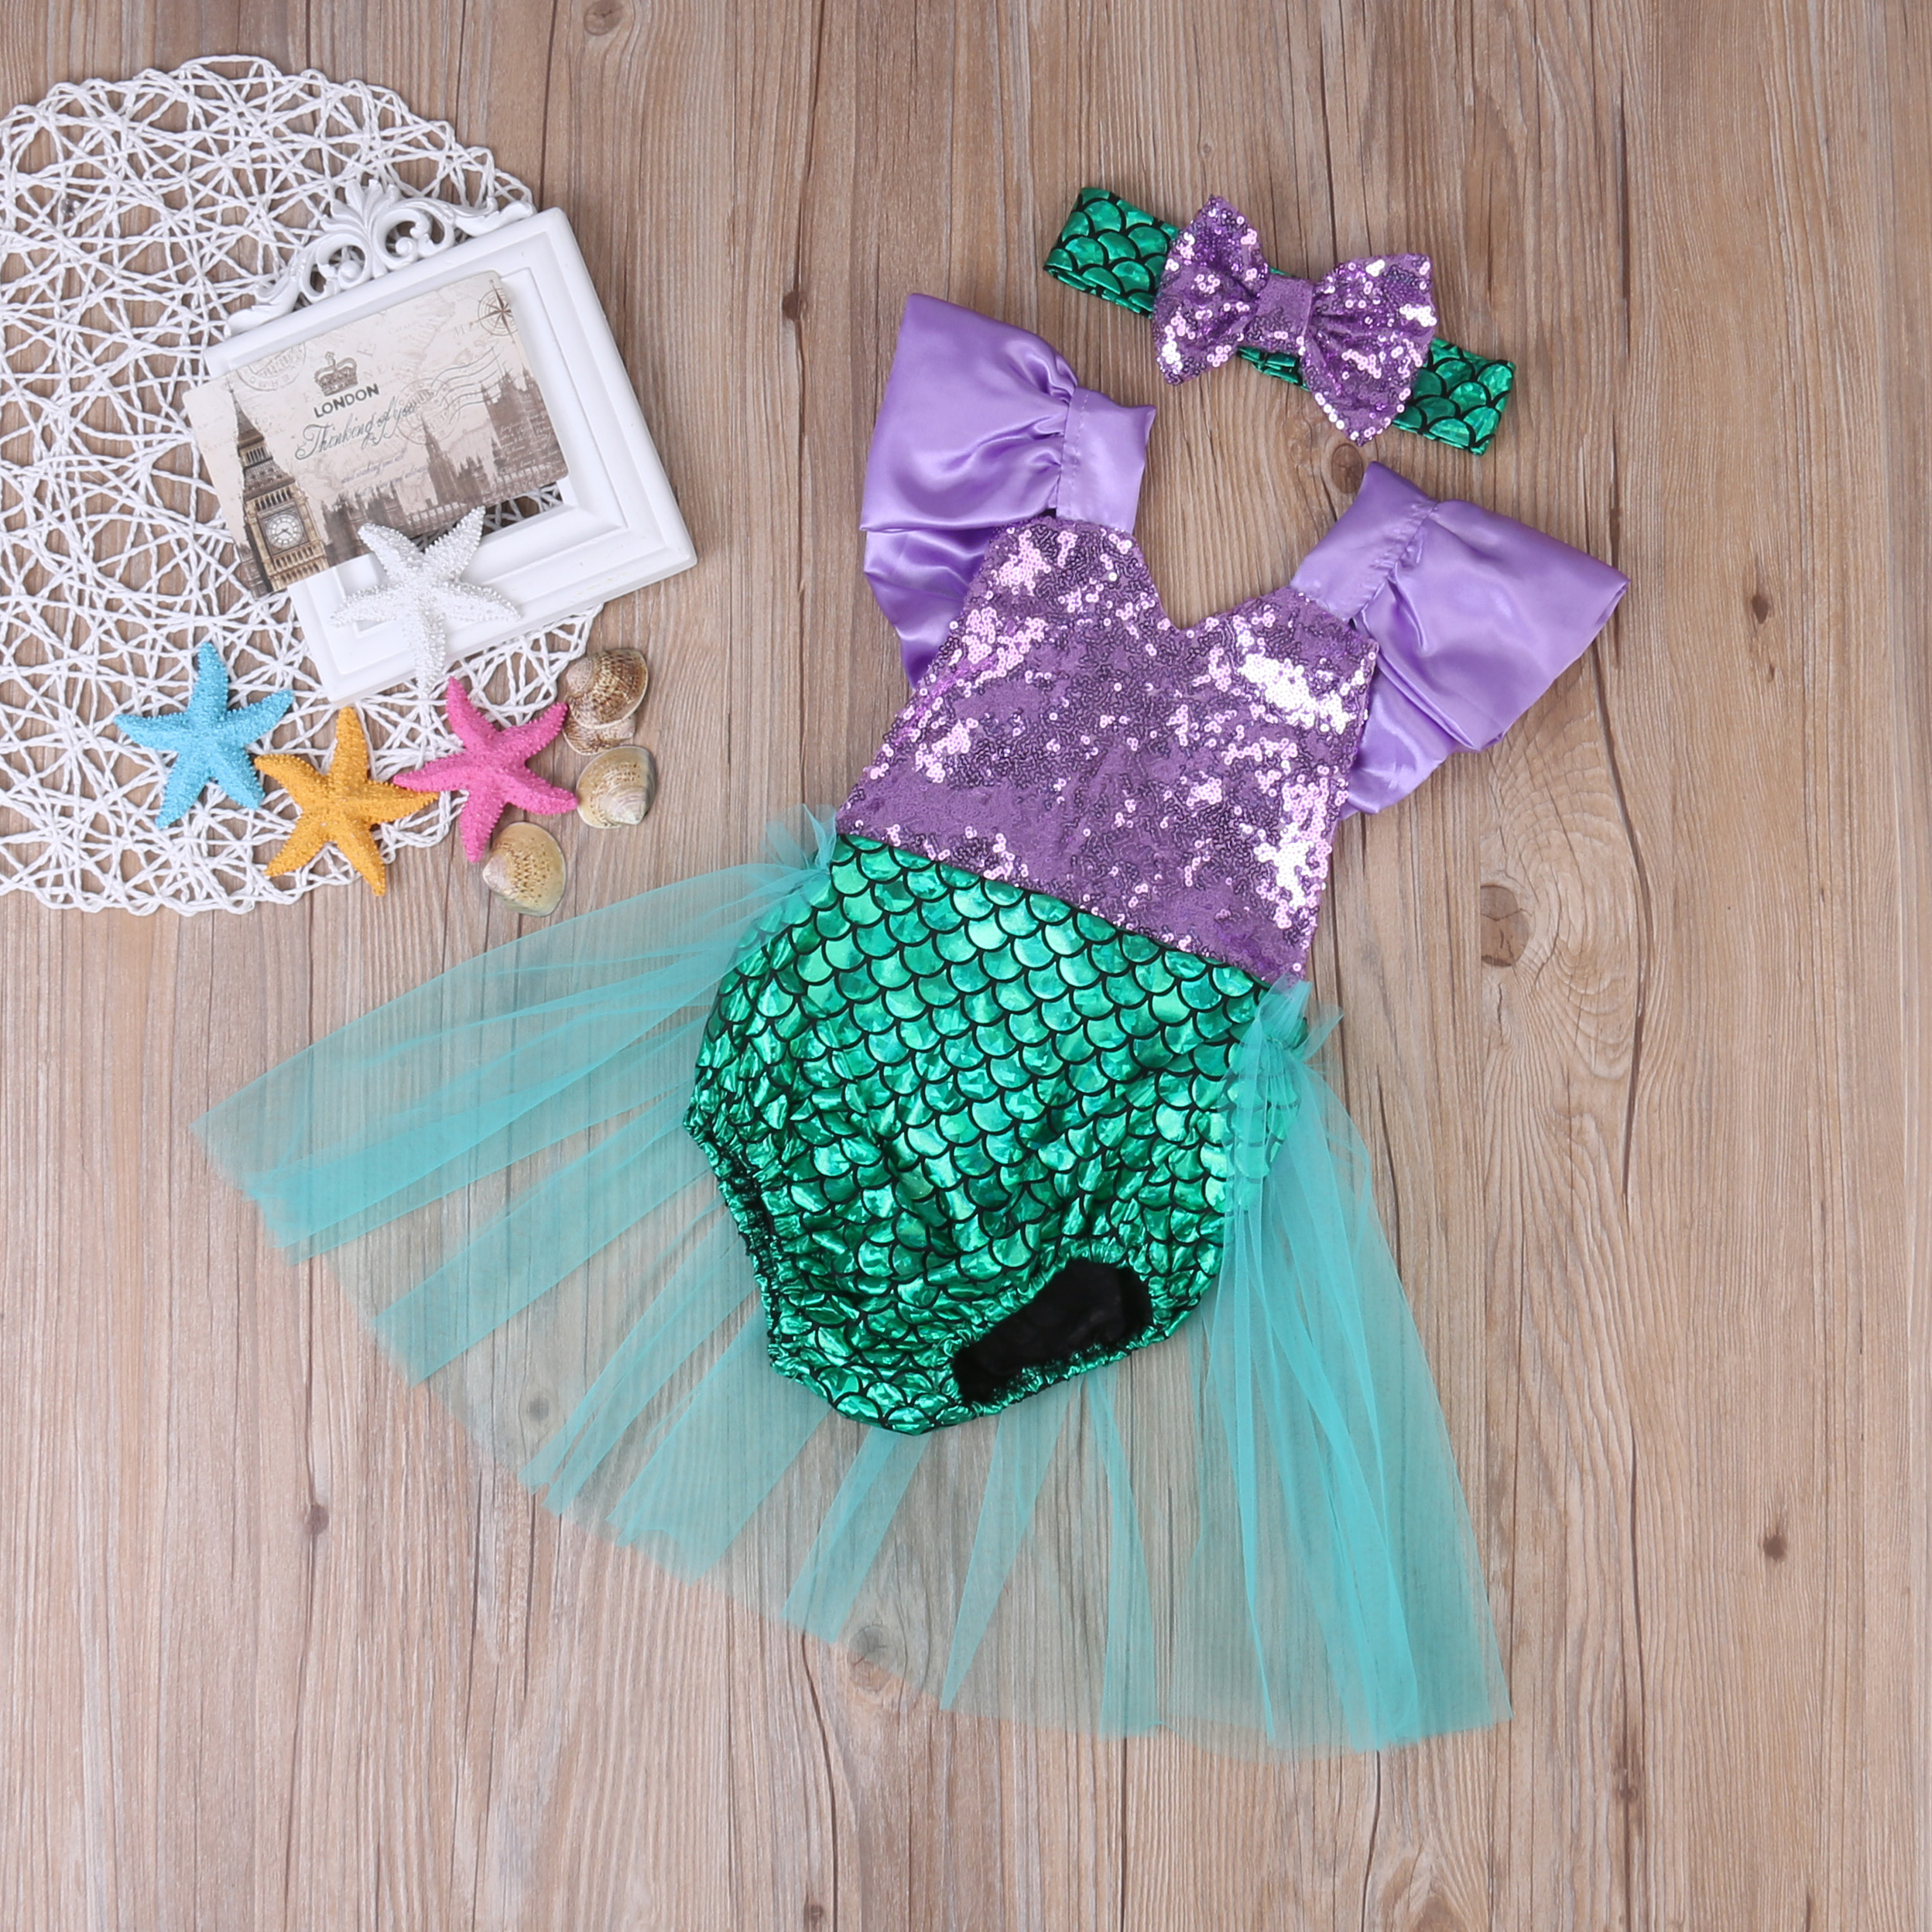 2017 Sequins Mermaid Newborn Baby Girl Summer Tutu Skirted Romper Bodysuit Jumpsuit +Headband 2PCS Outfits Kids Clothing Set  недорого